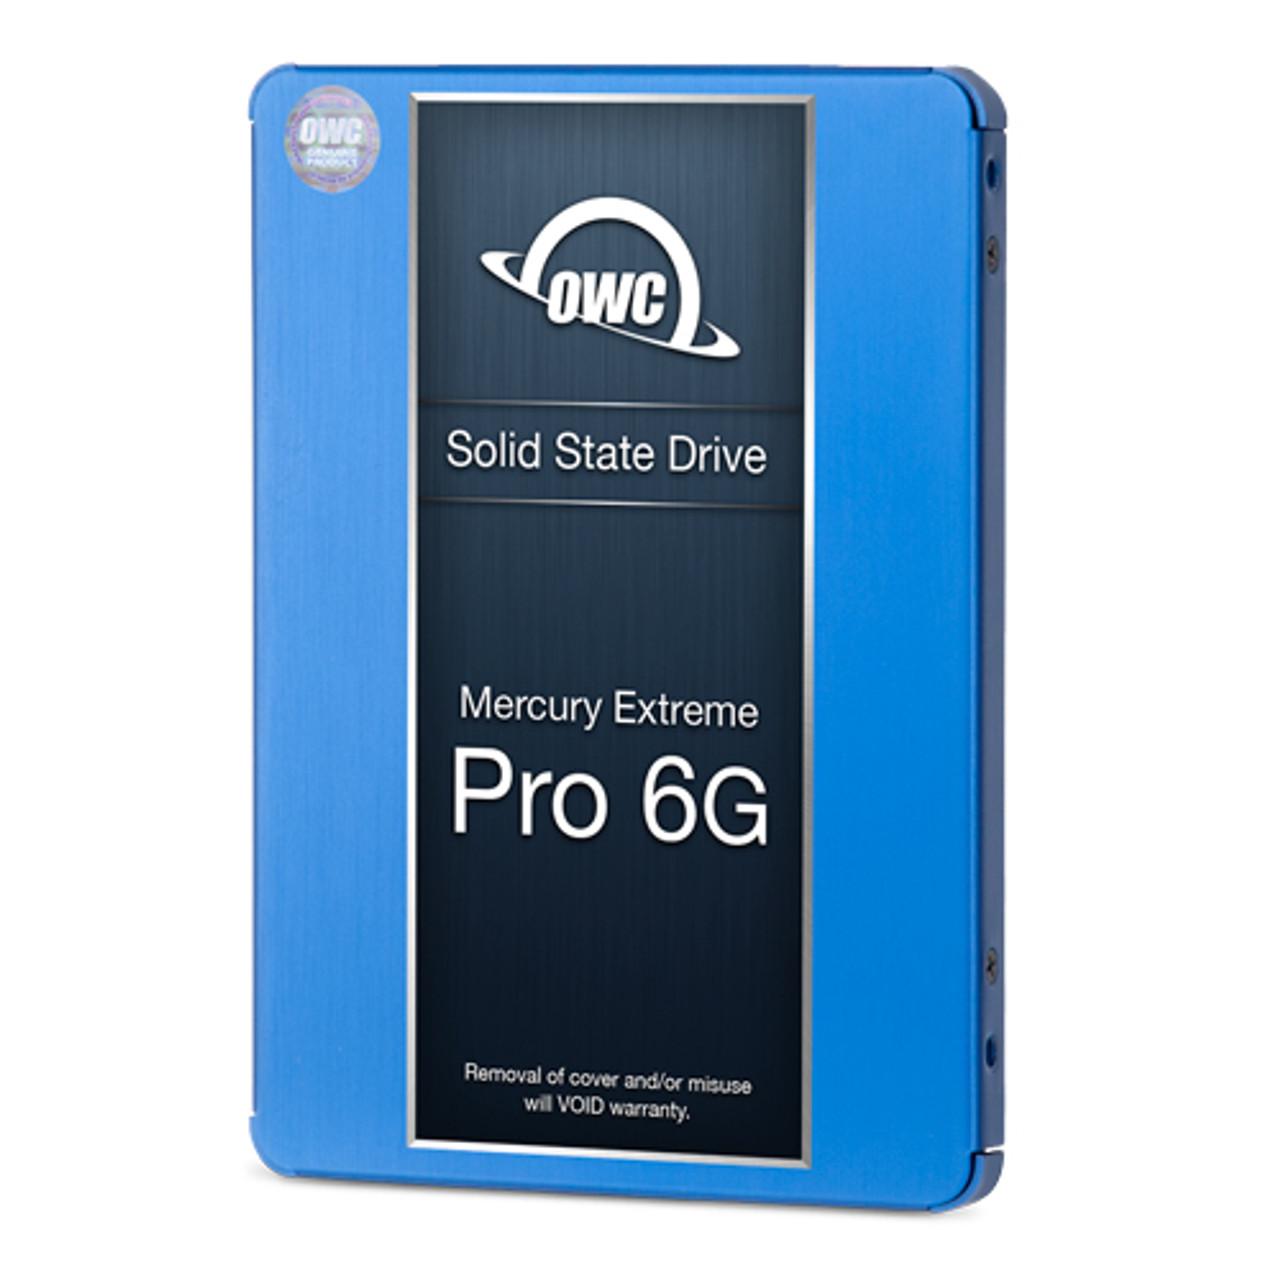 240GB OWC Mercury Extreme 6G SSD - SSD Bay Add-In Kit for 2011 27-inch iMacs